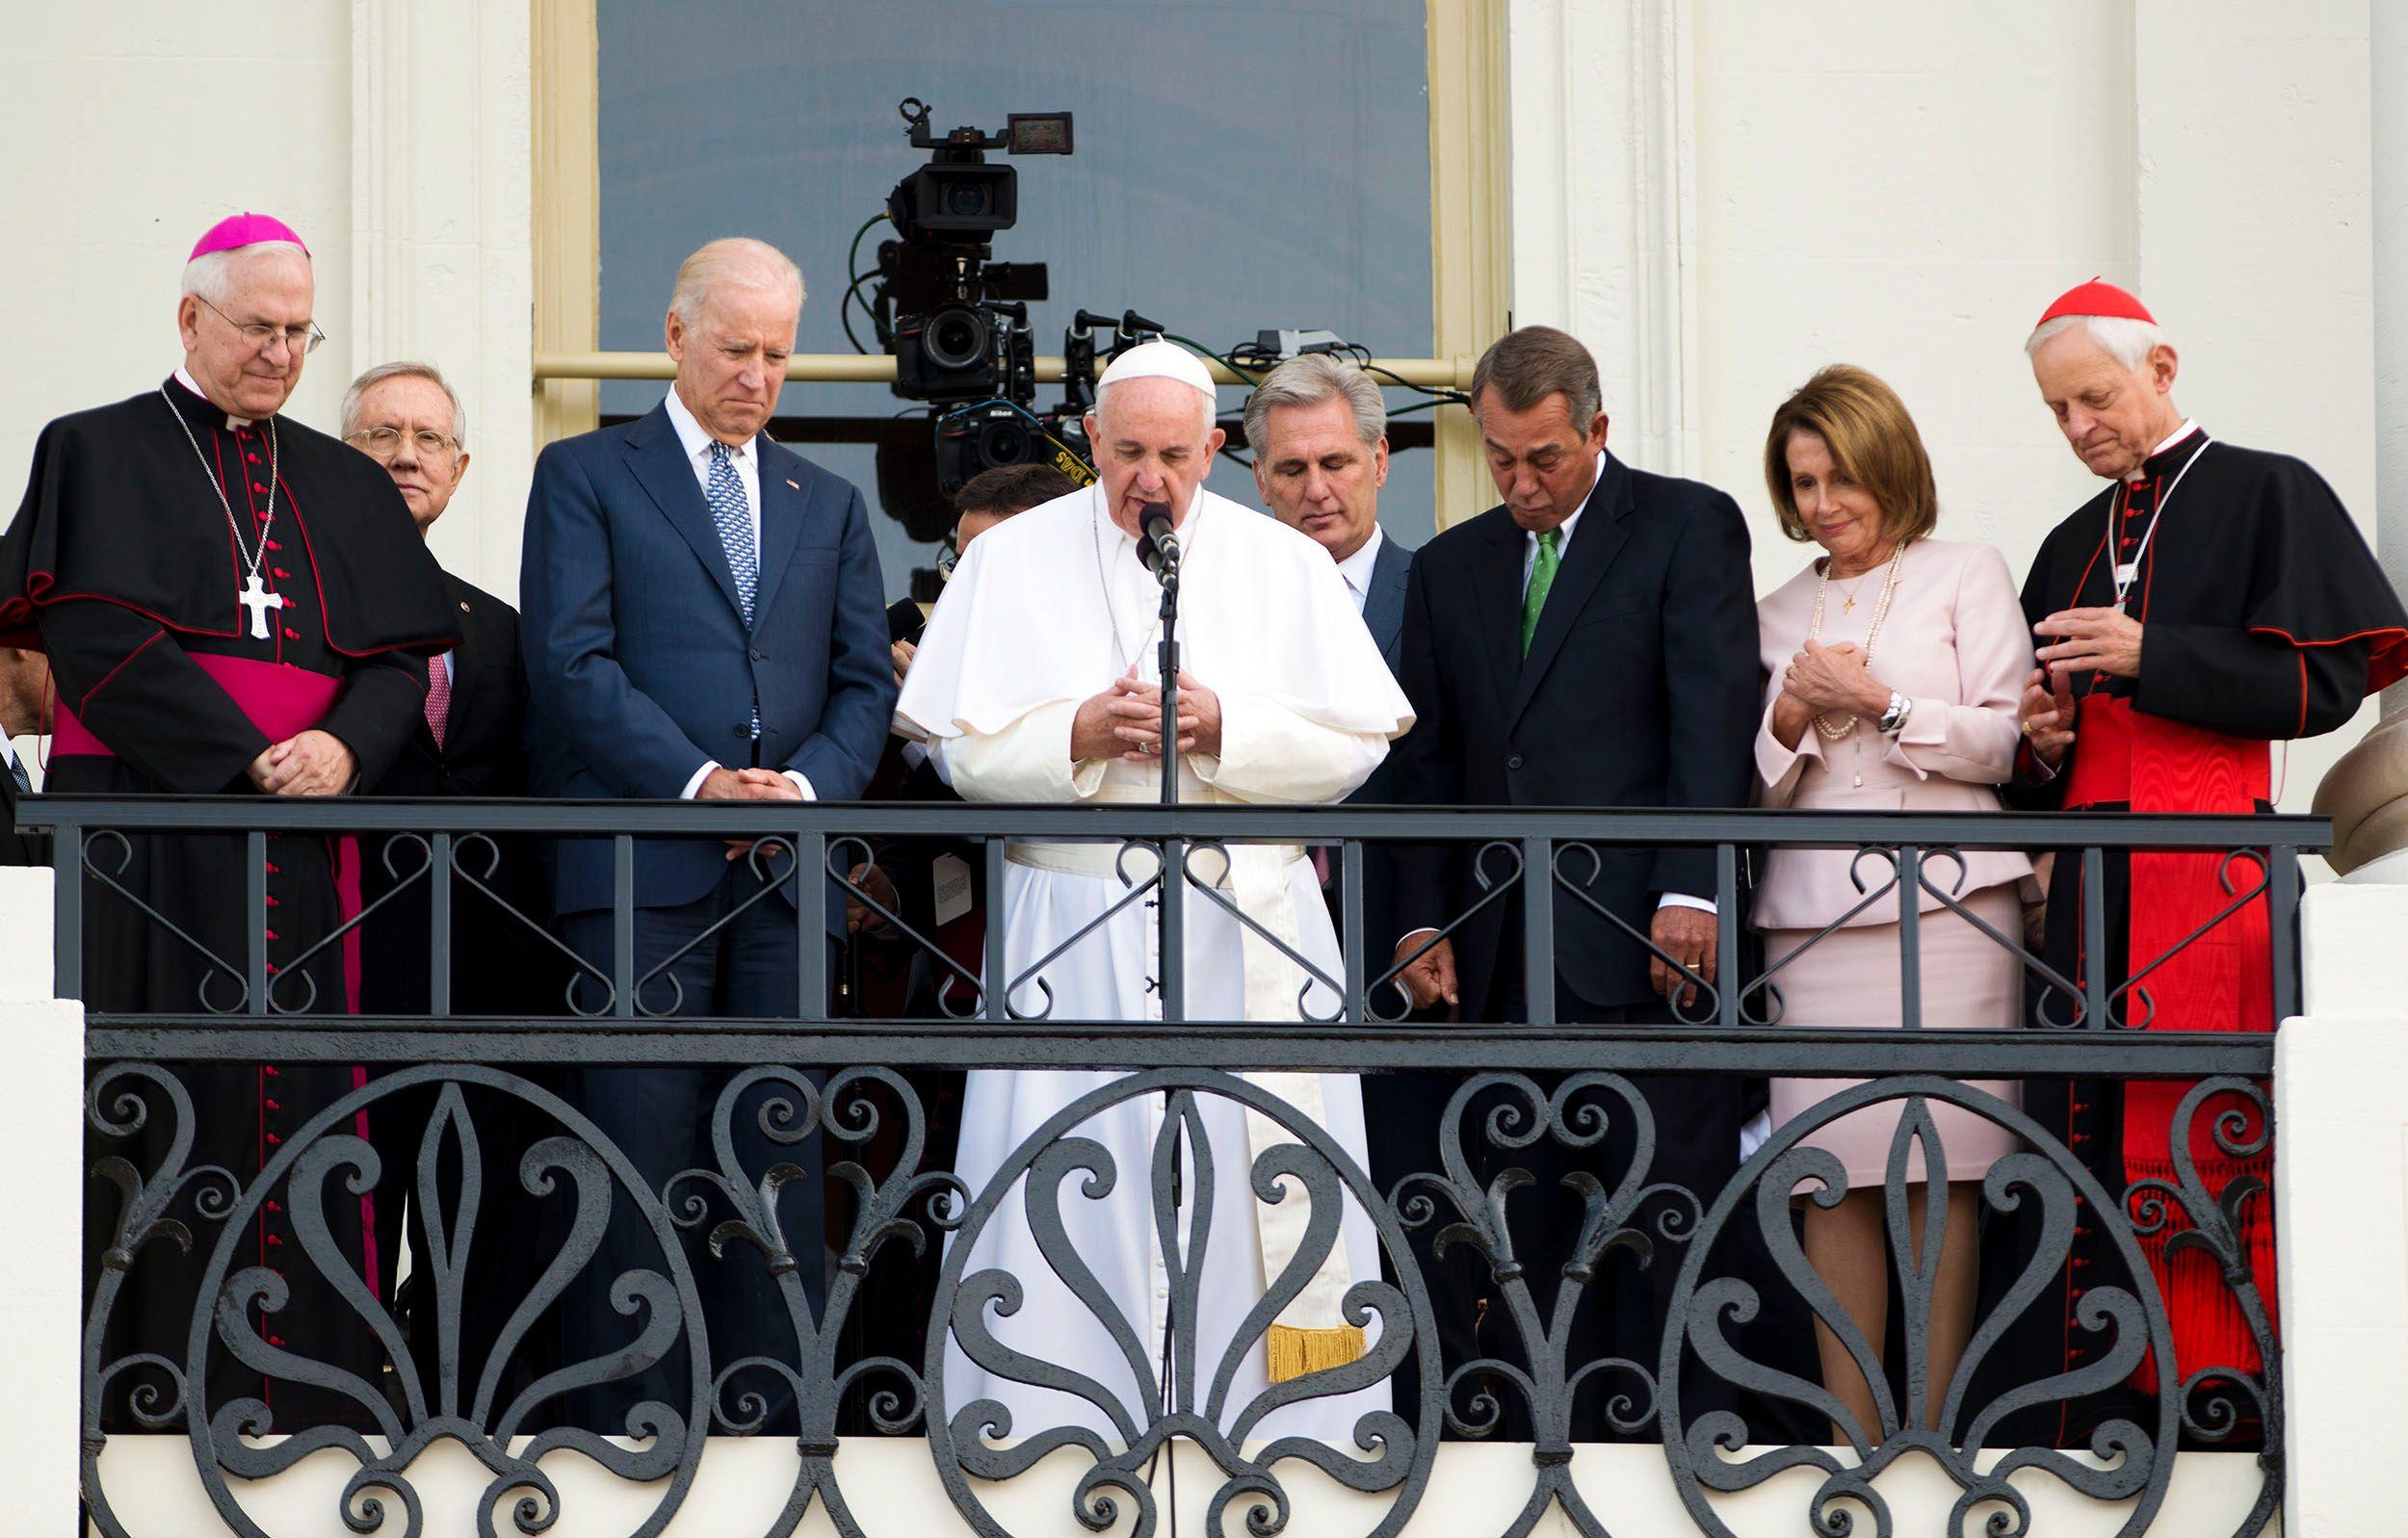 PopeBalconyWeb.jpg